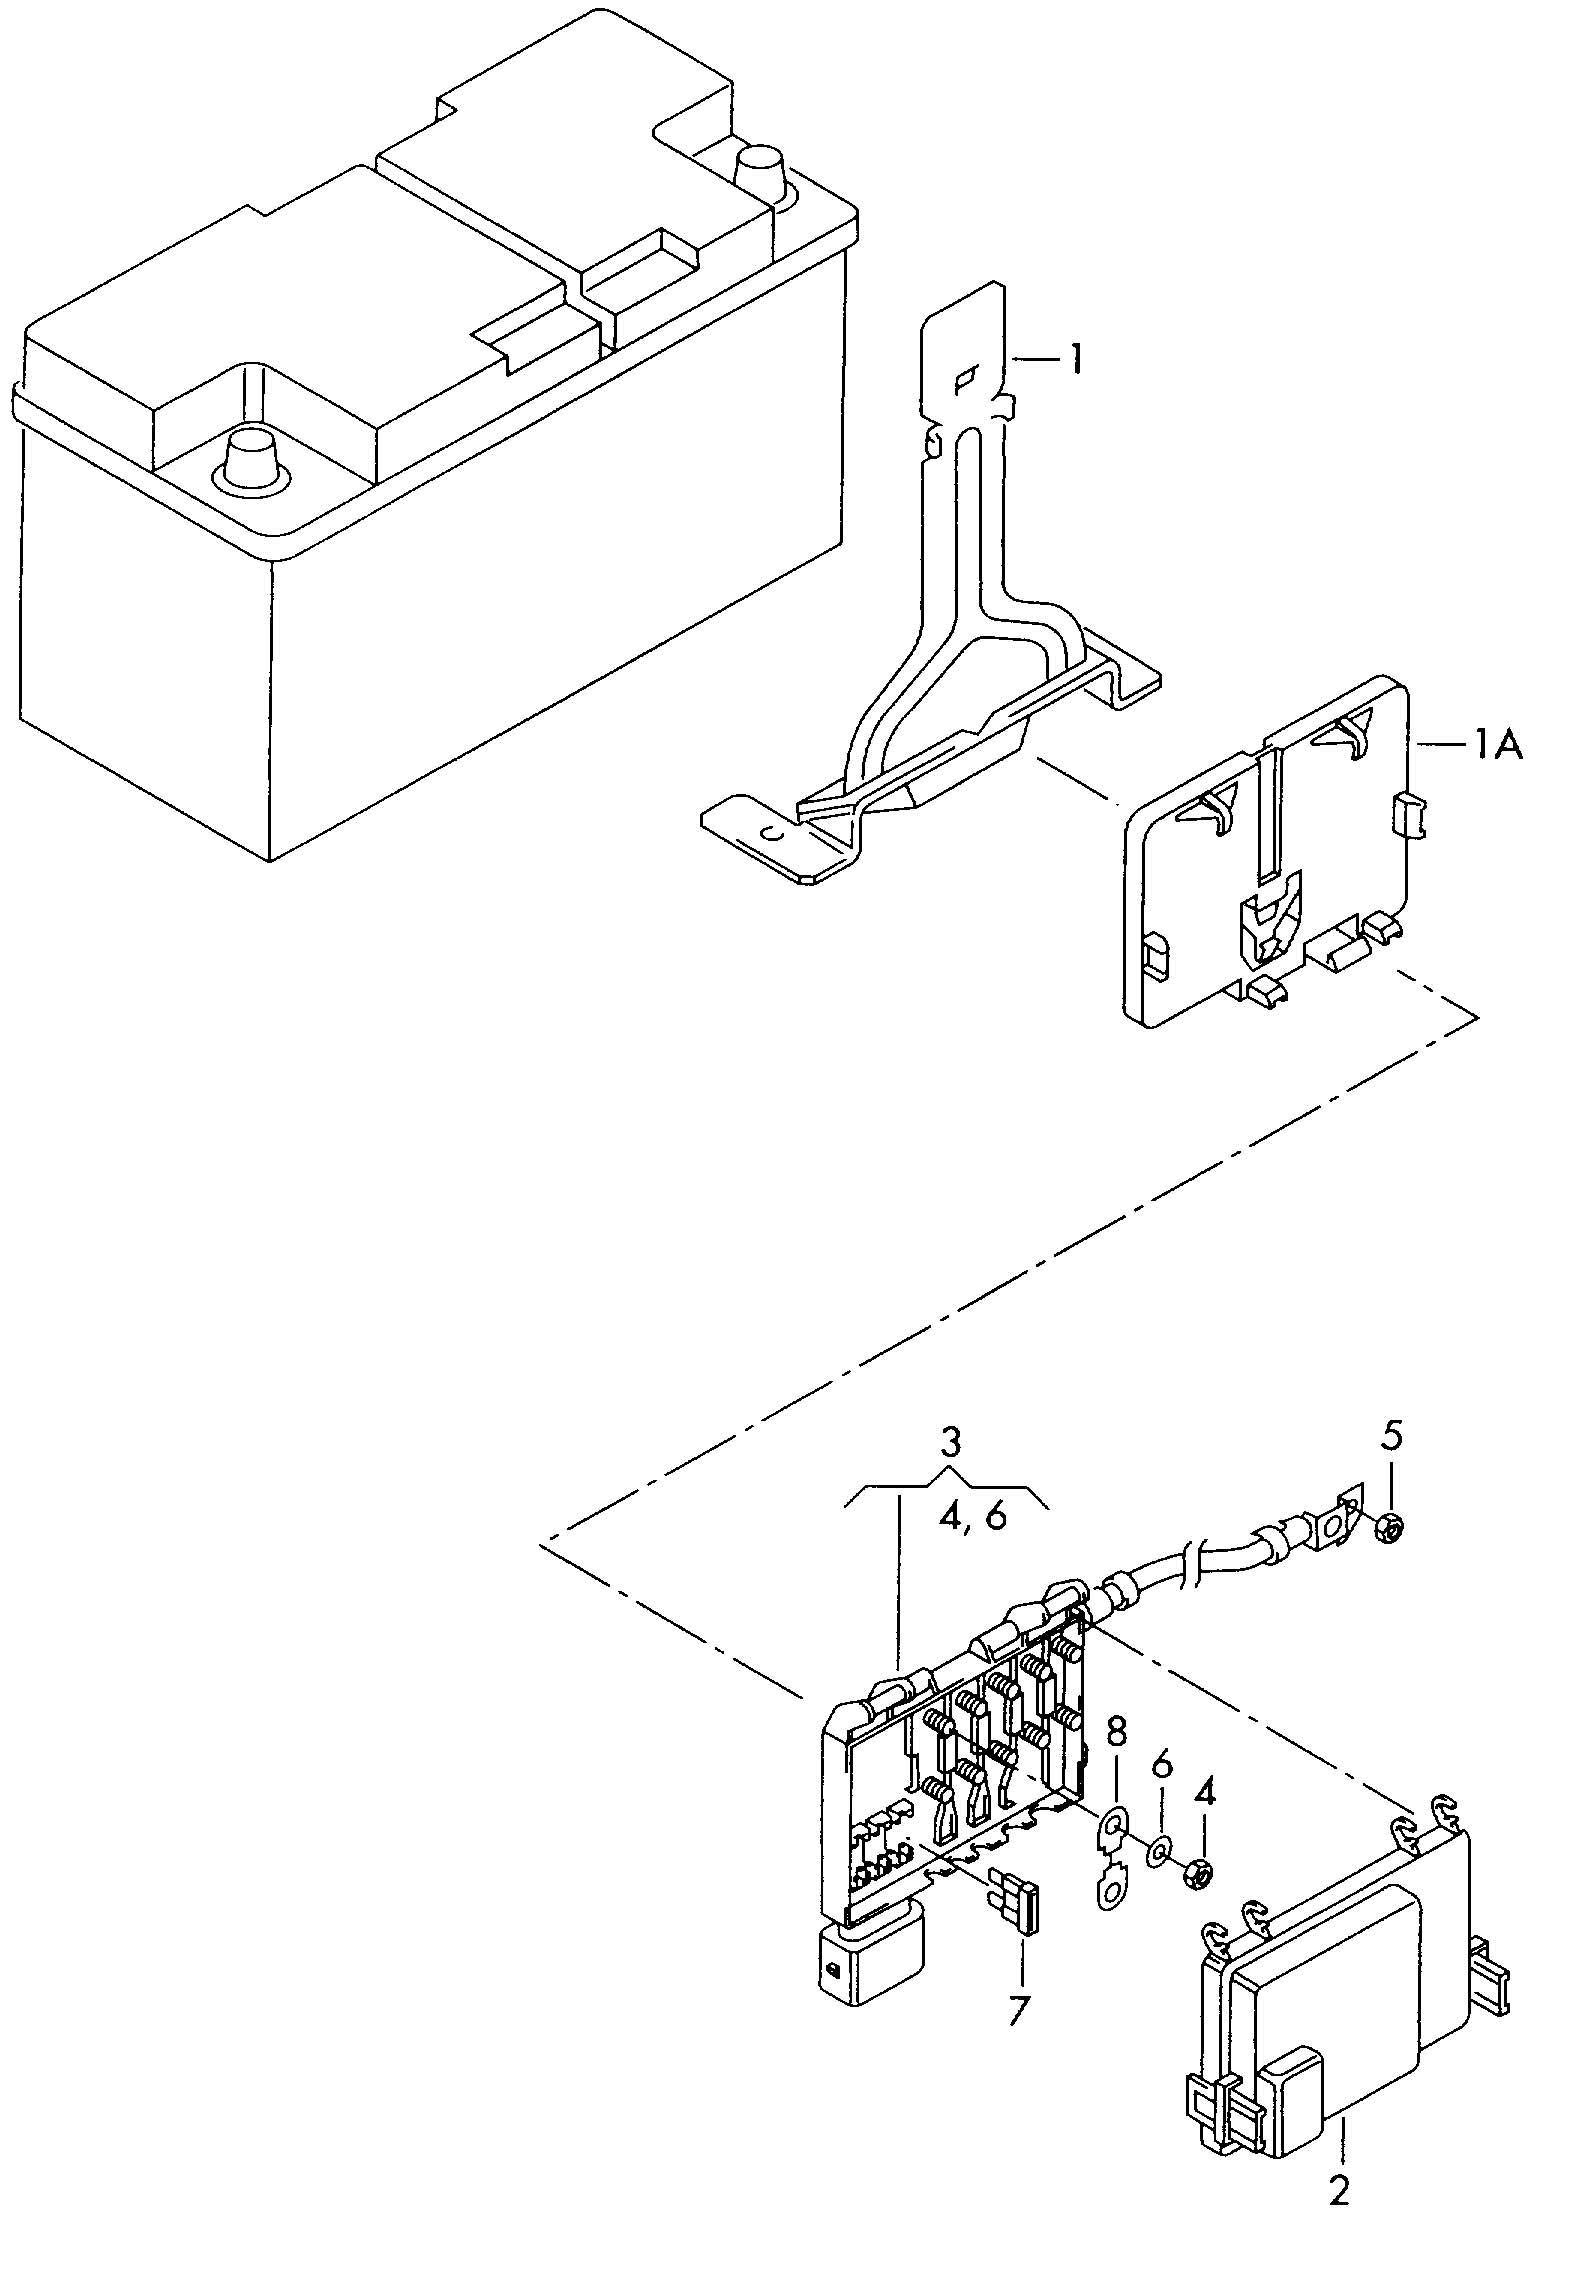 fuse diagram for 2002 vw eurovan